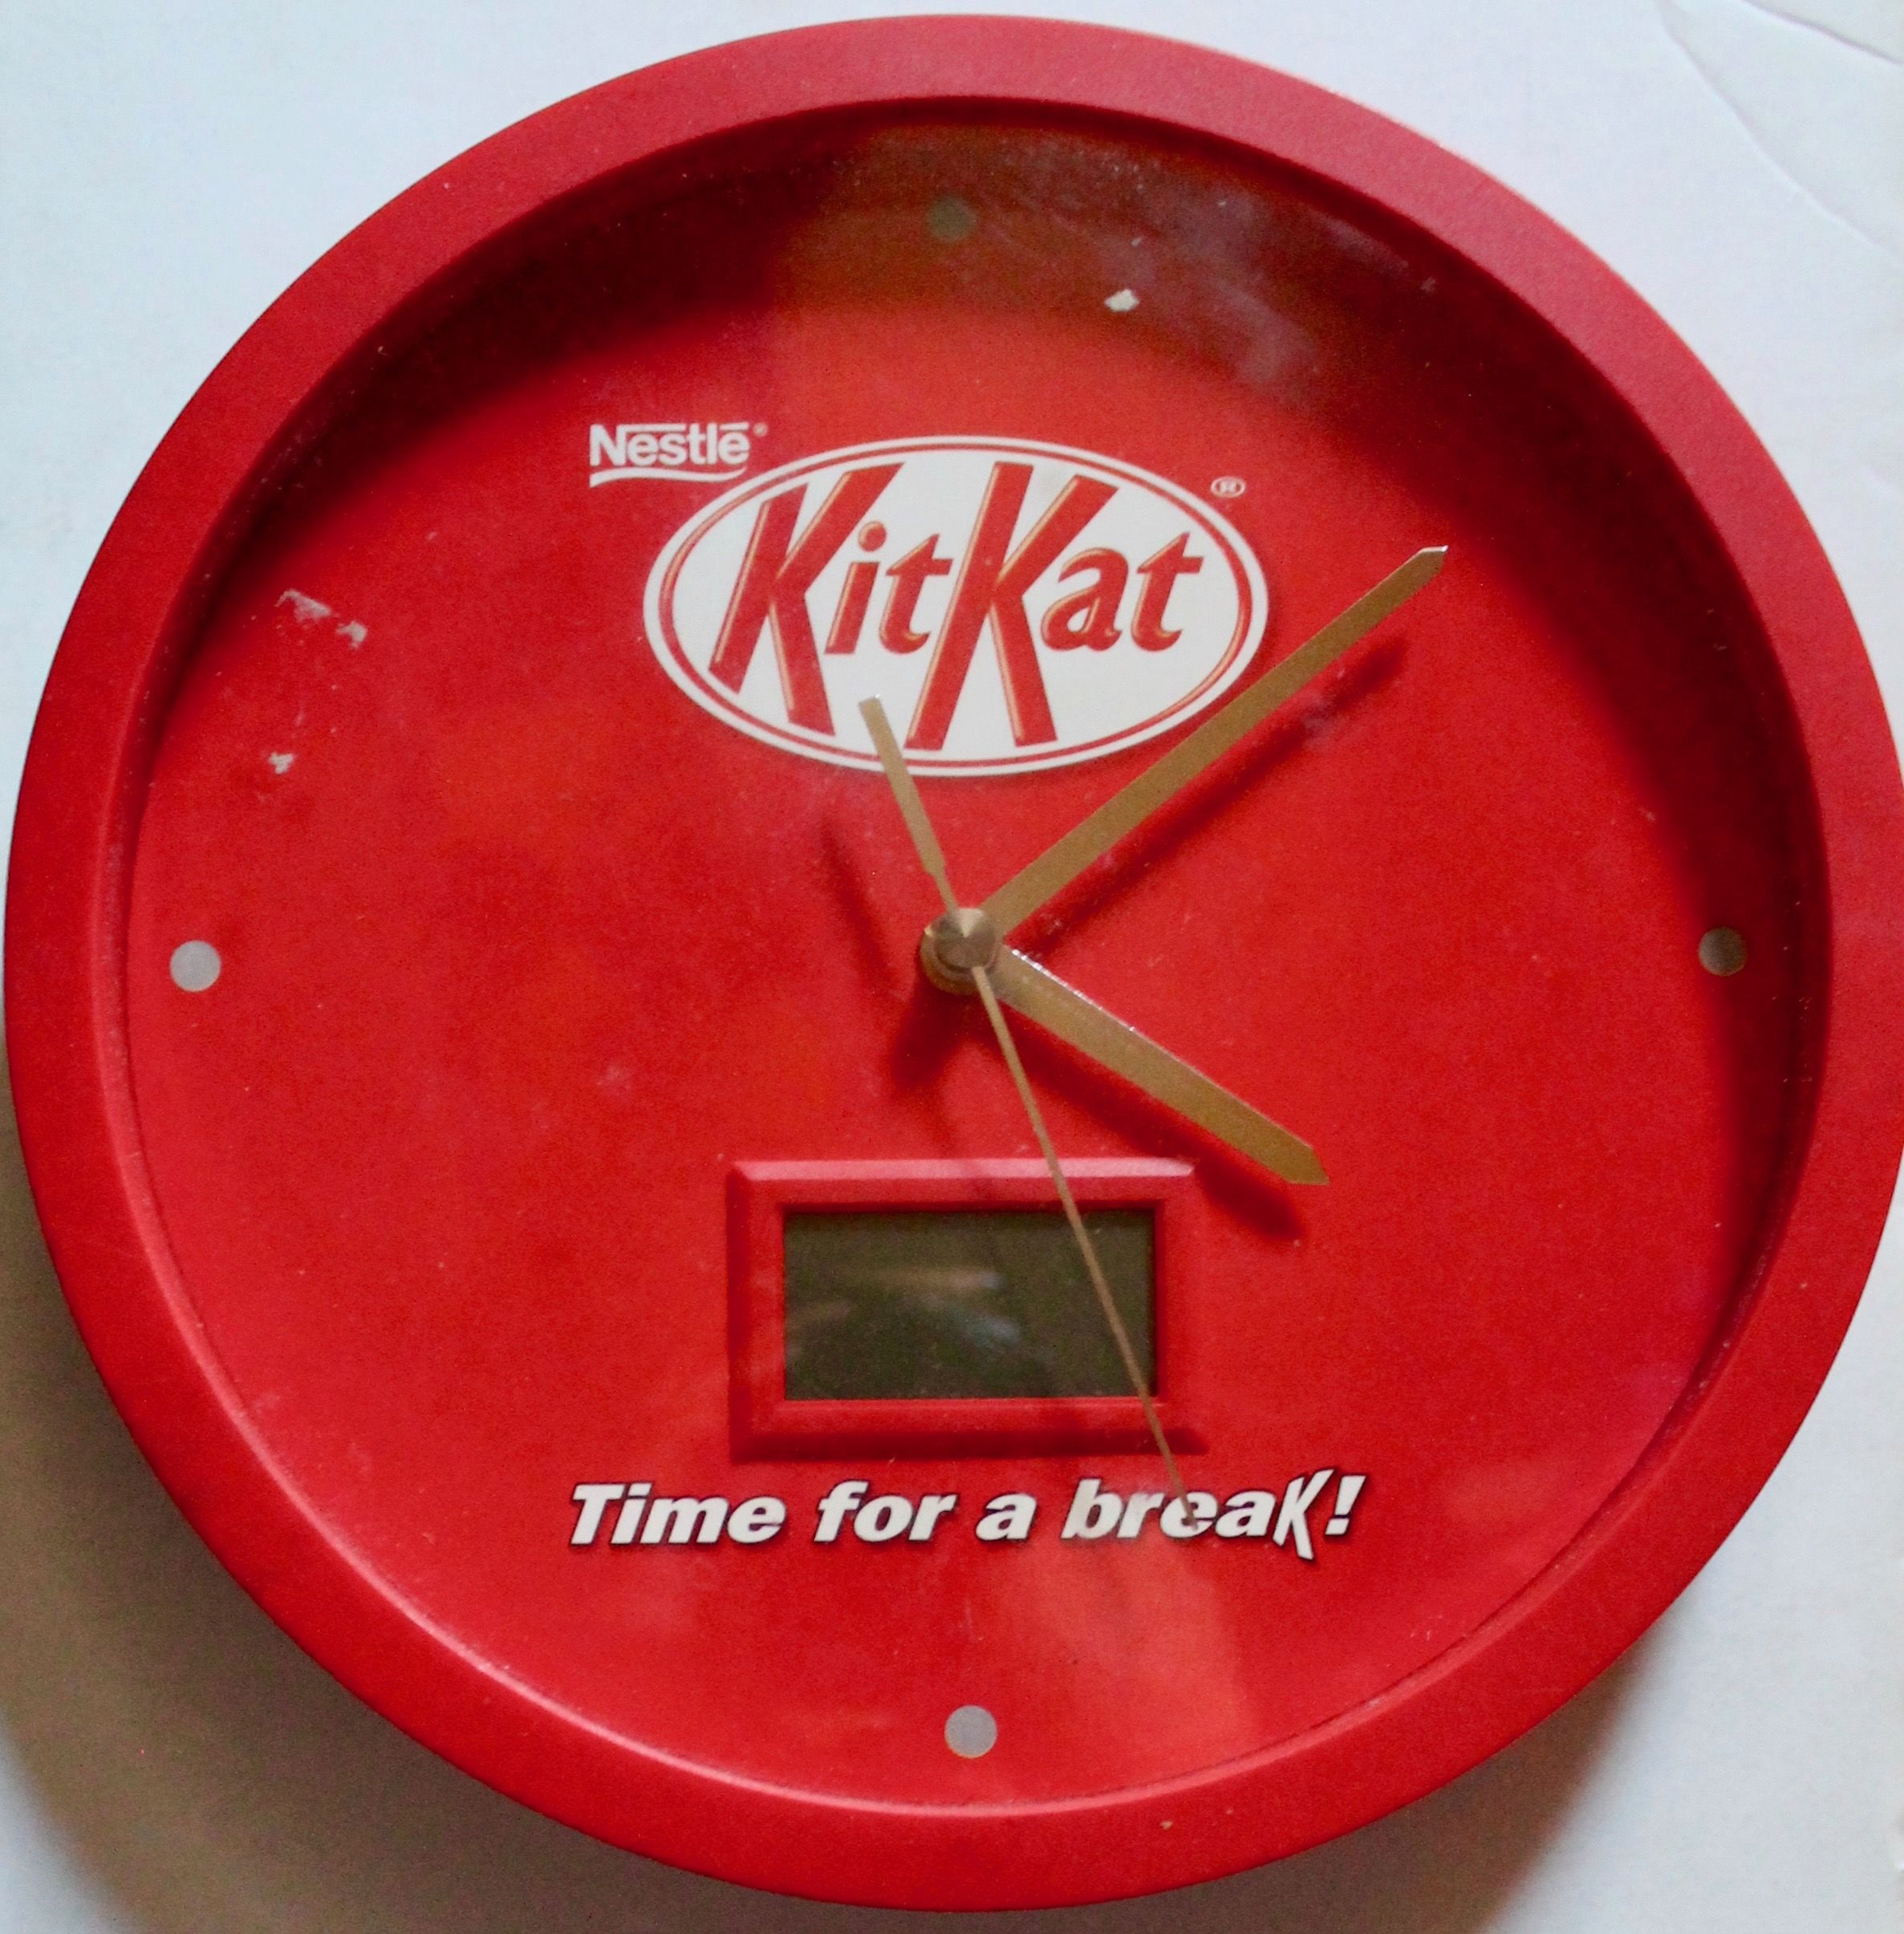 Nestle Kit Kat clock, (analogue and digital) I'm not sure